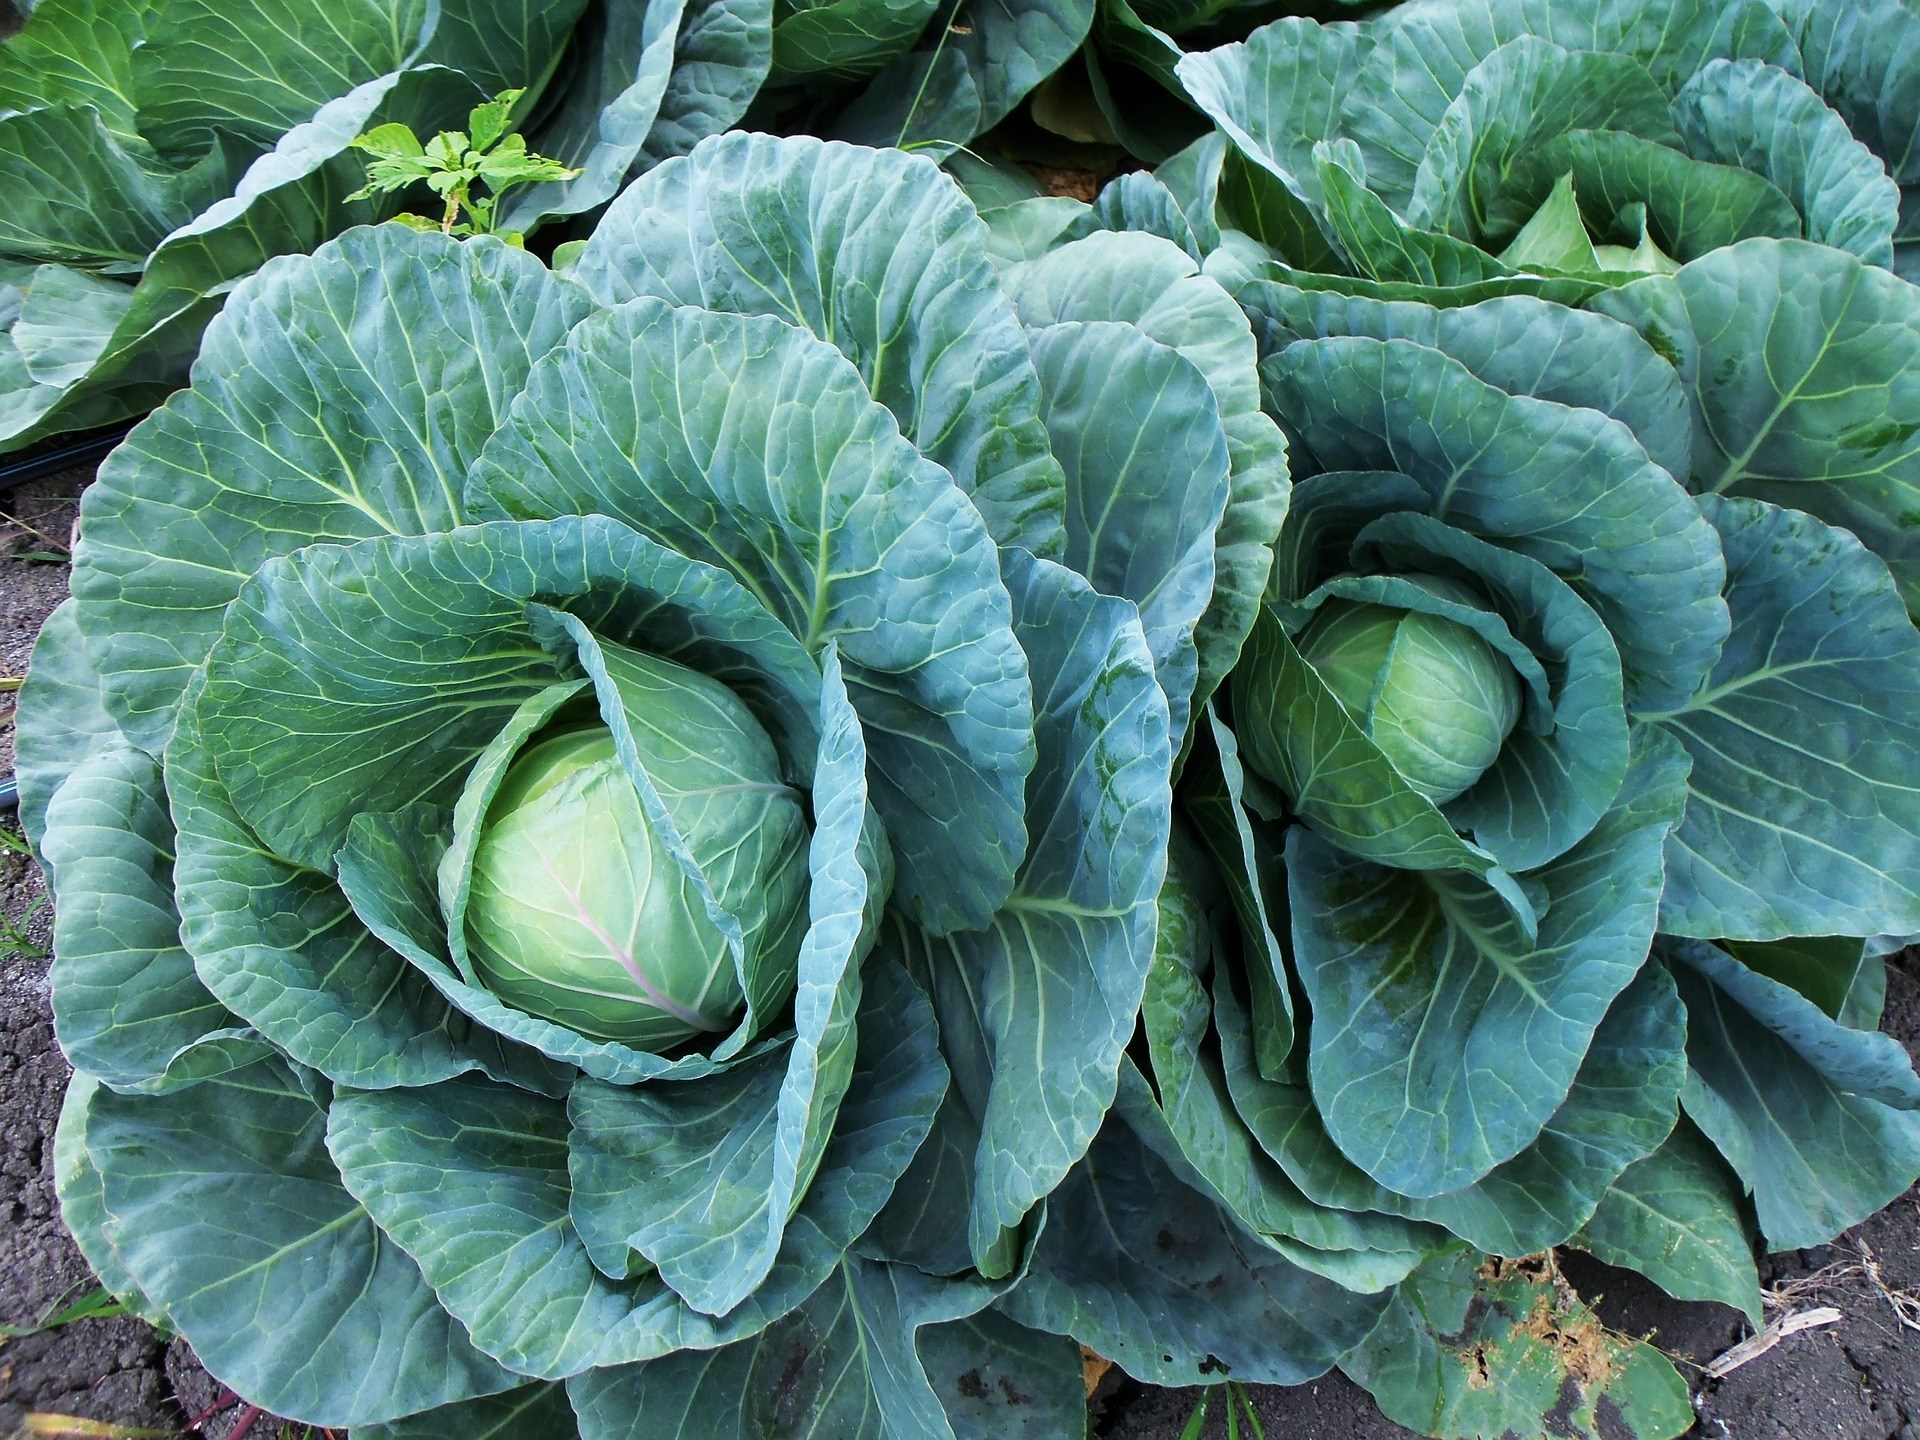 Eating Vegan in Portugal Cabbage